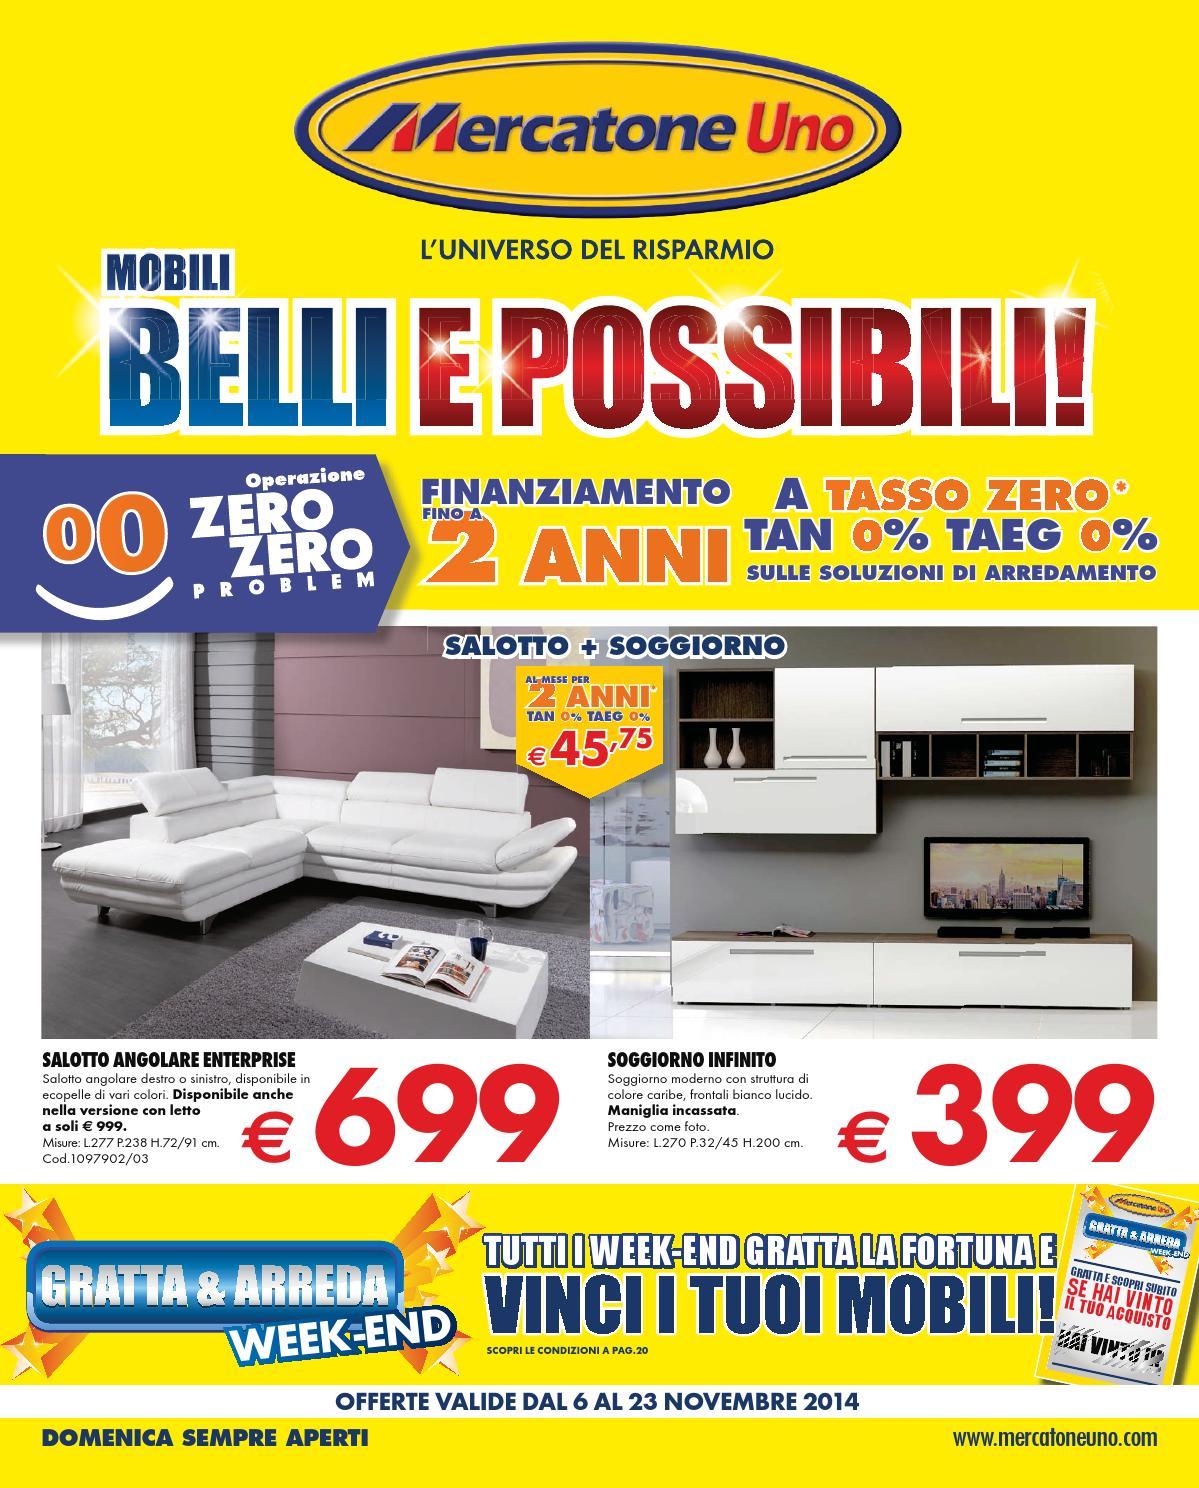 mercatoneuno 23nov by volavolantino - issuu - Tavoli Da Cucina Mercatone Uno